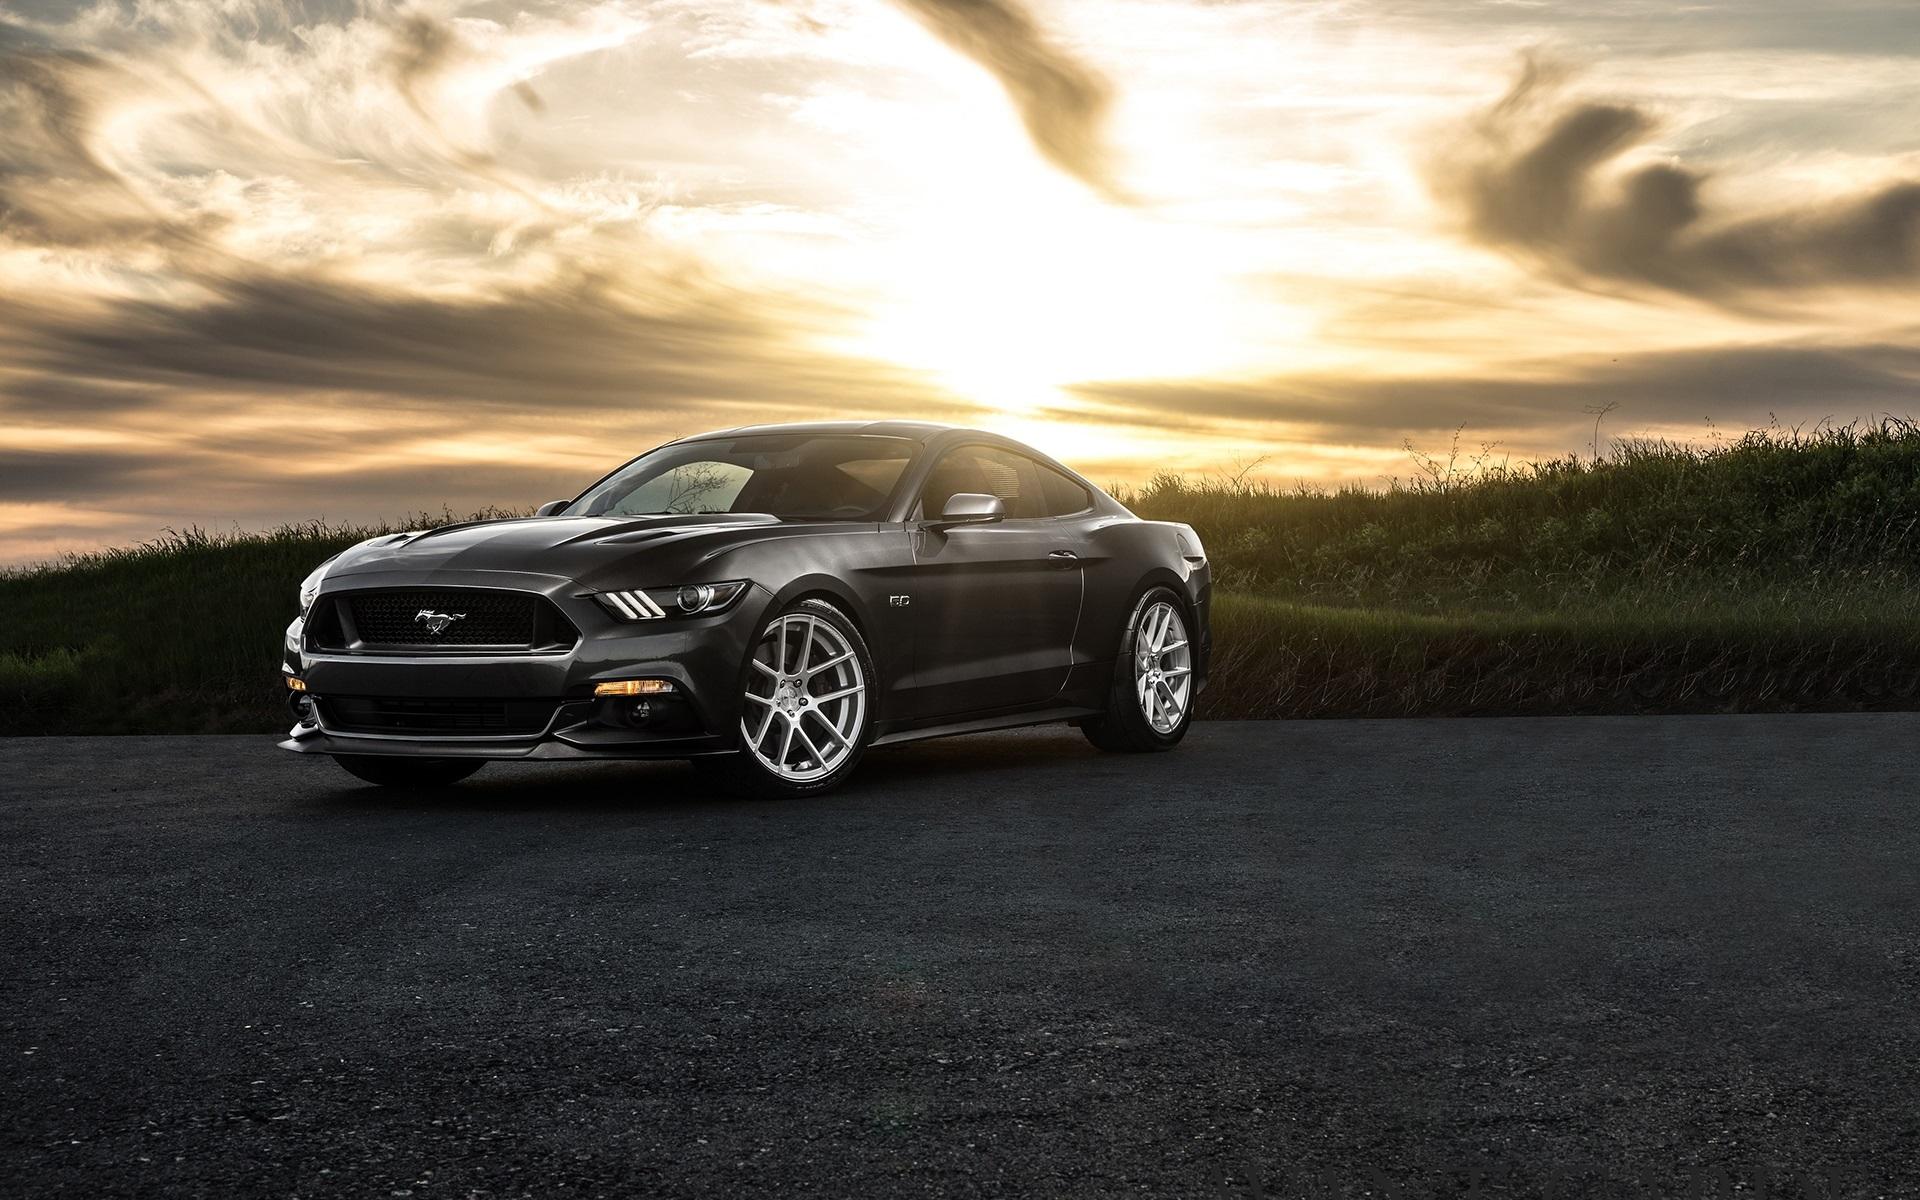 Wallpaper Ford Mustang 2015, black car, dusk 1920x1200 HD ...